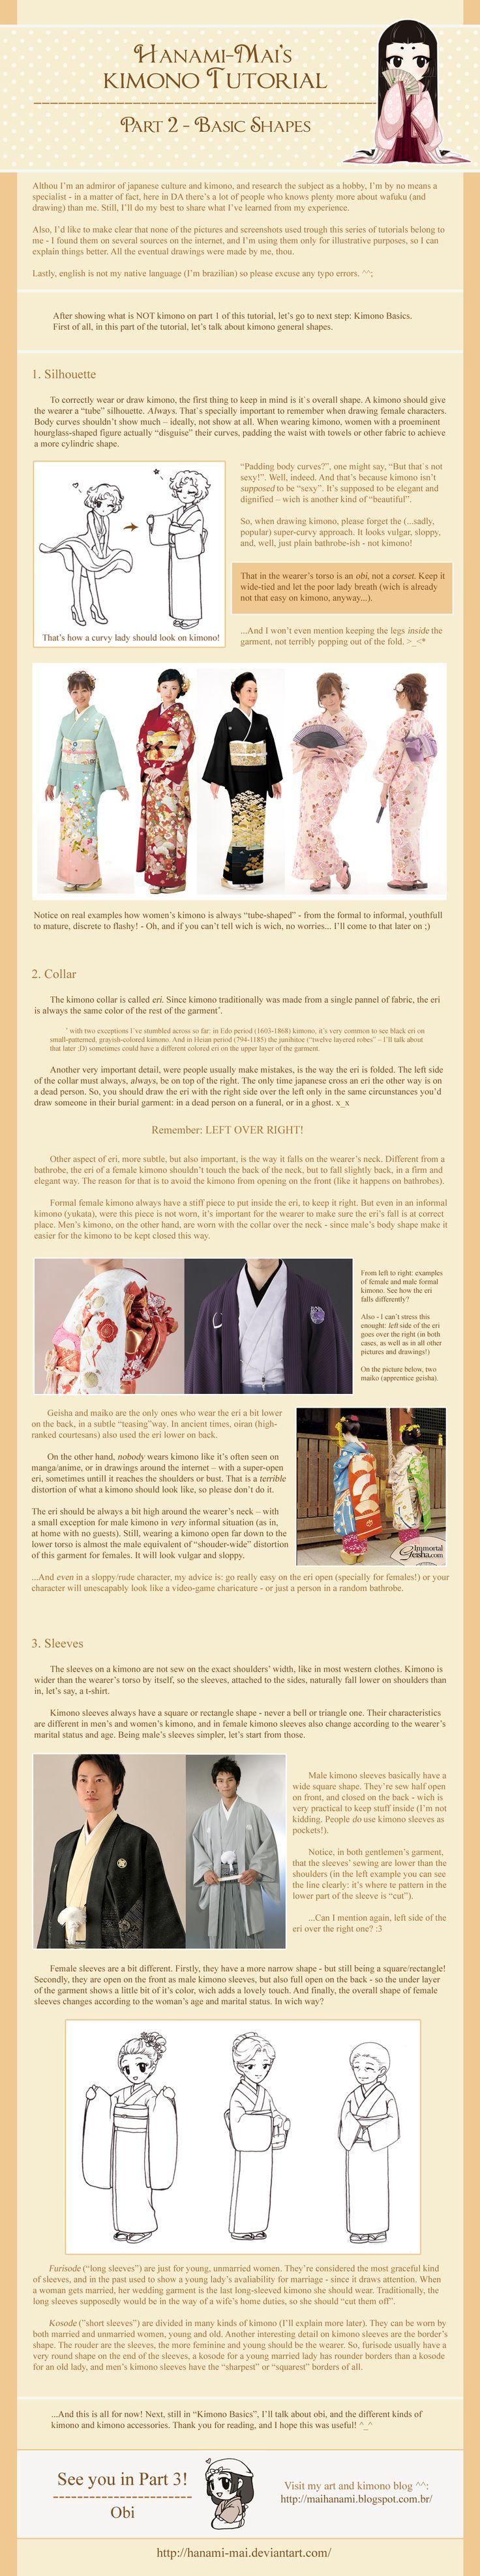 Kimono Tutorial - Part 02 by Hanami-Mai.deviantart.com on @deviantART